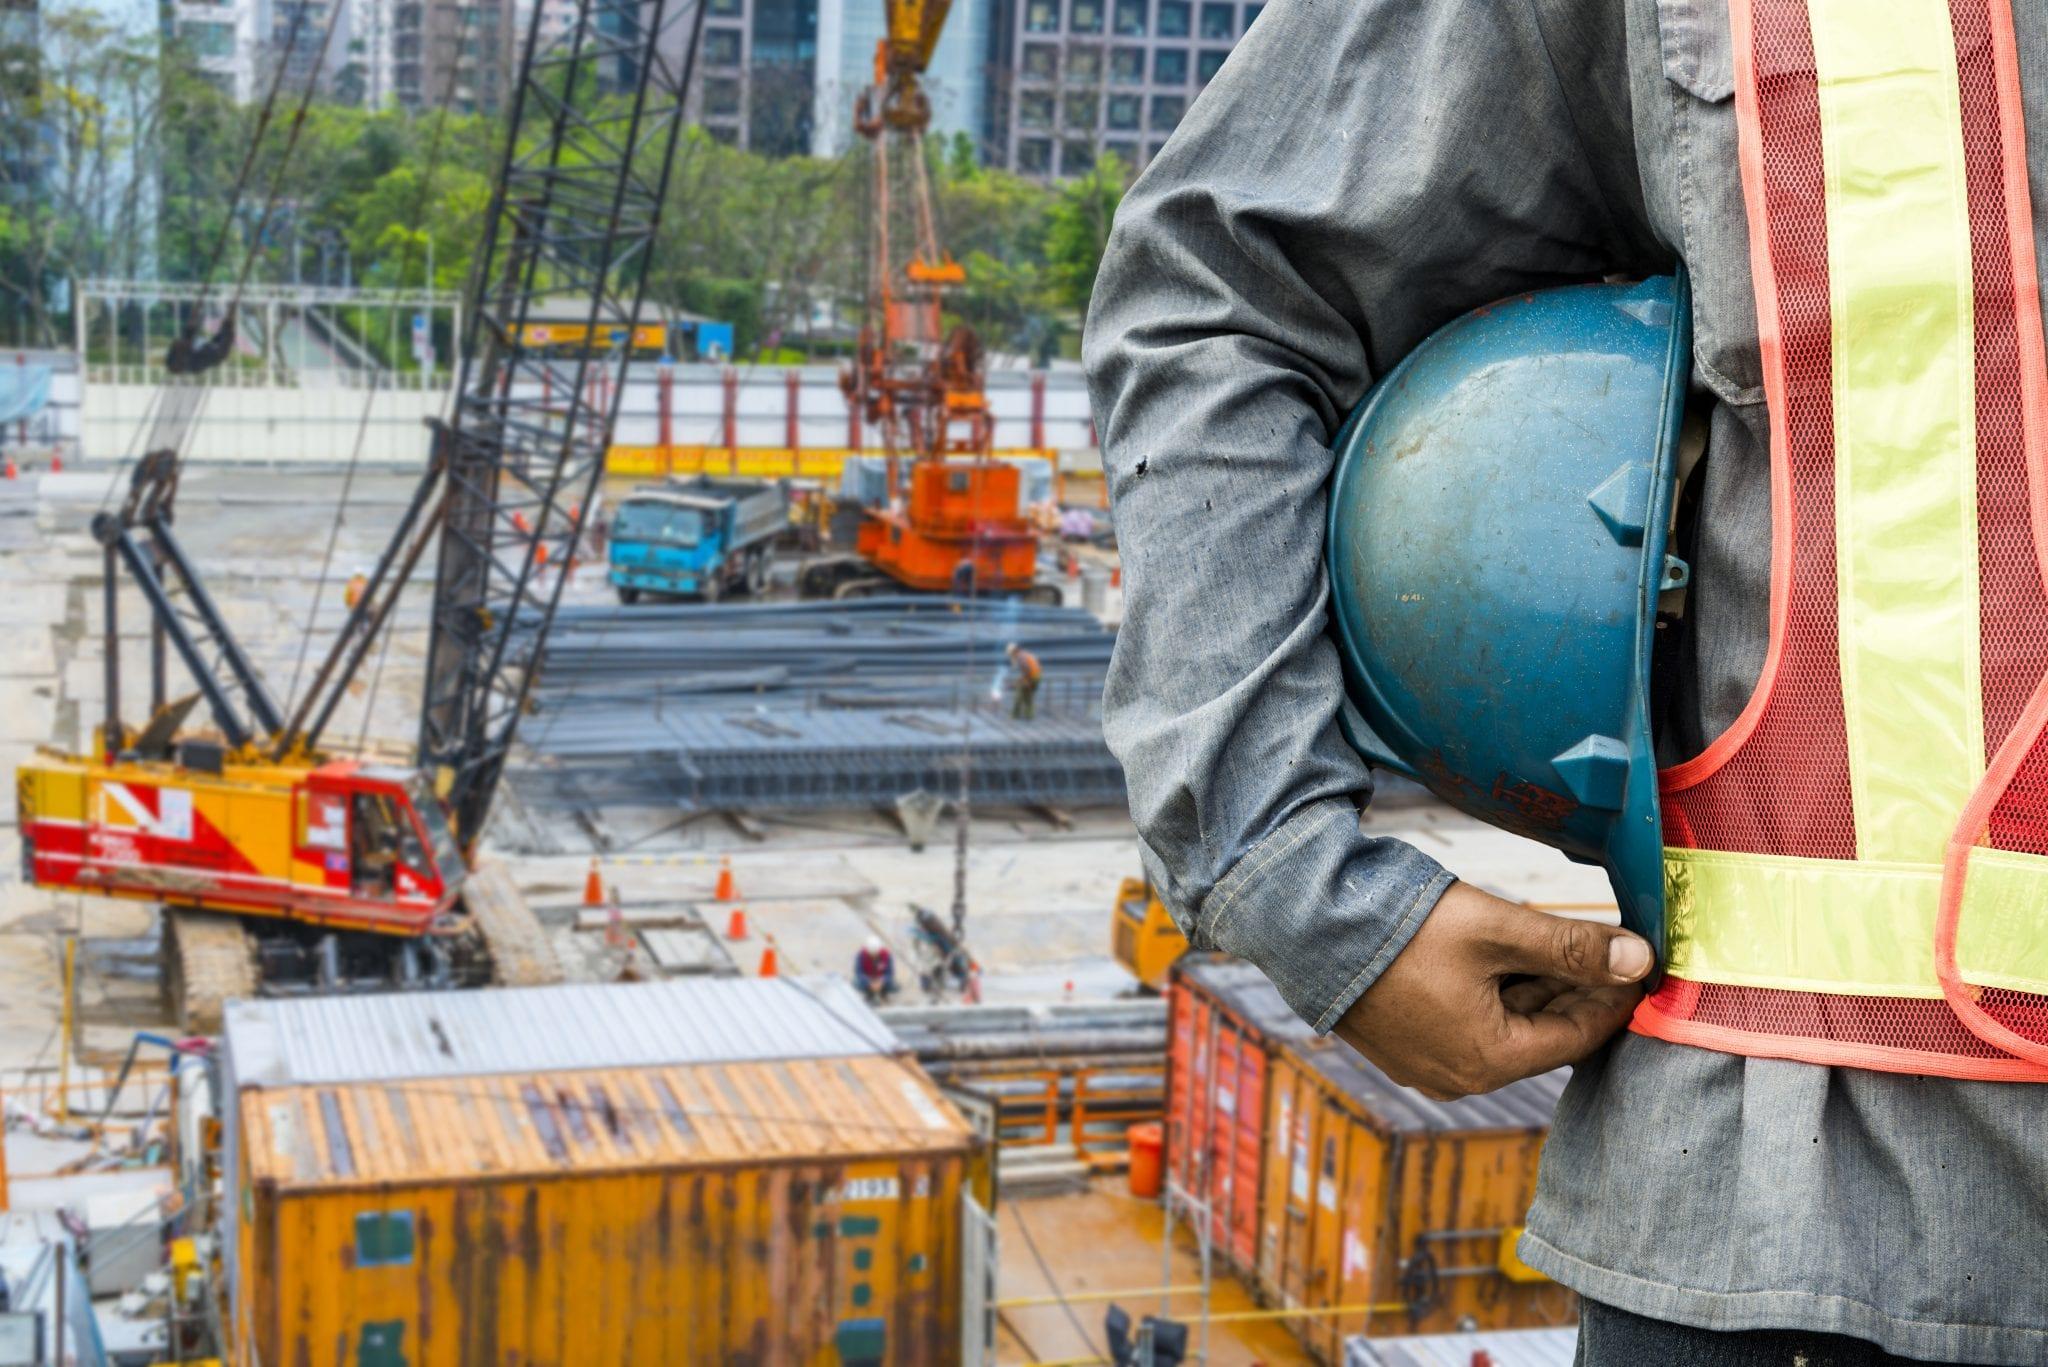 No Workman's Comp? Legal Remedies for TX Construction Accidents